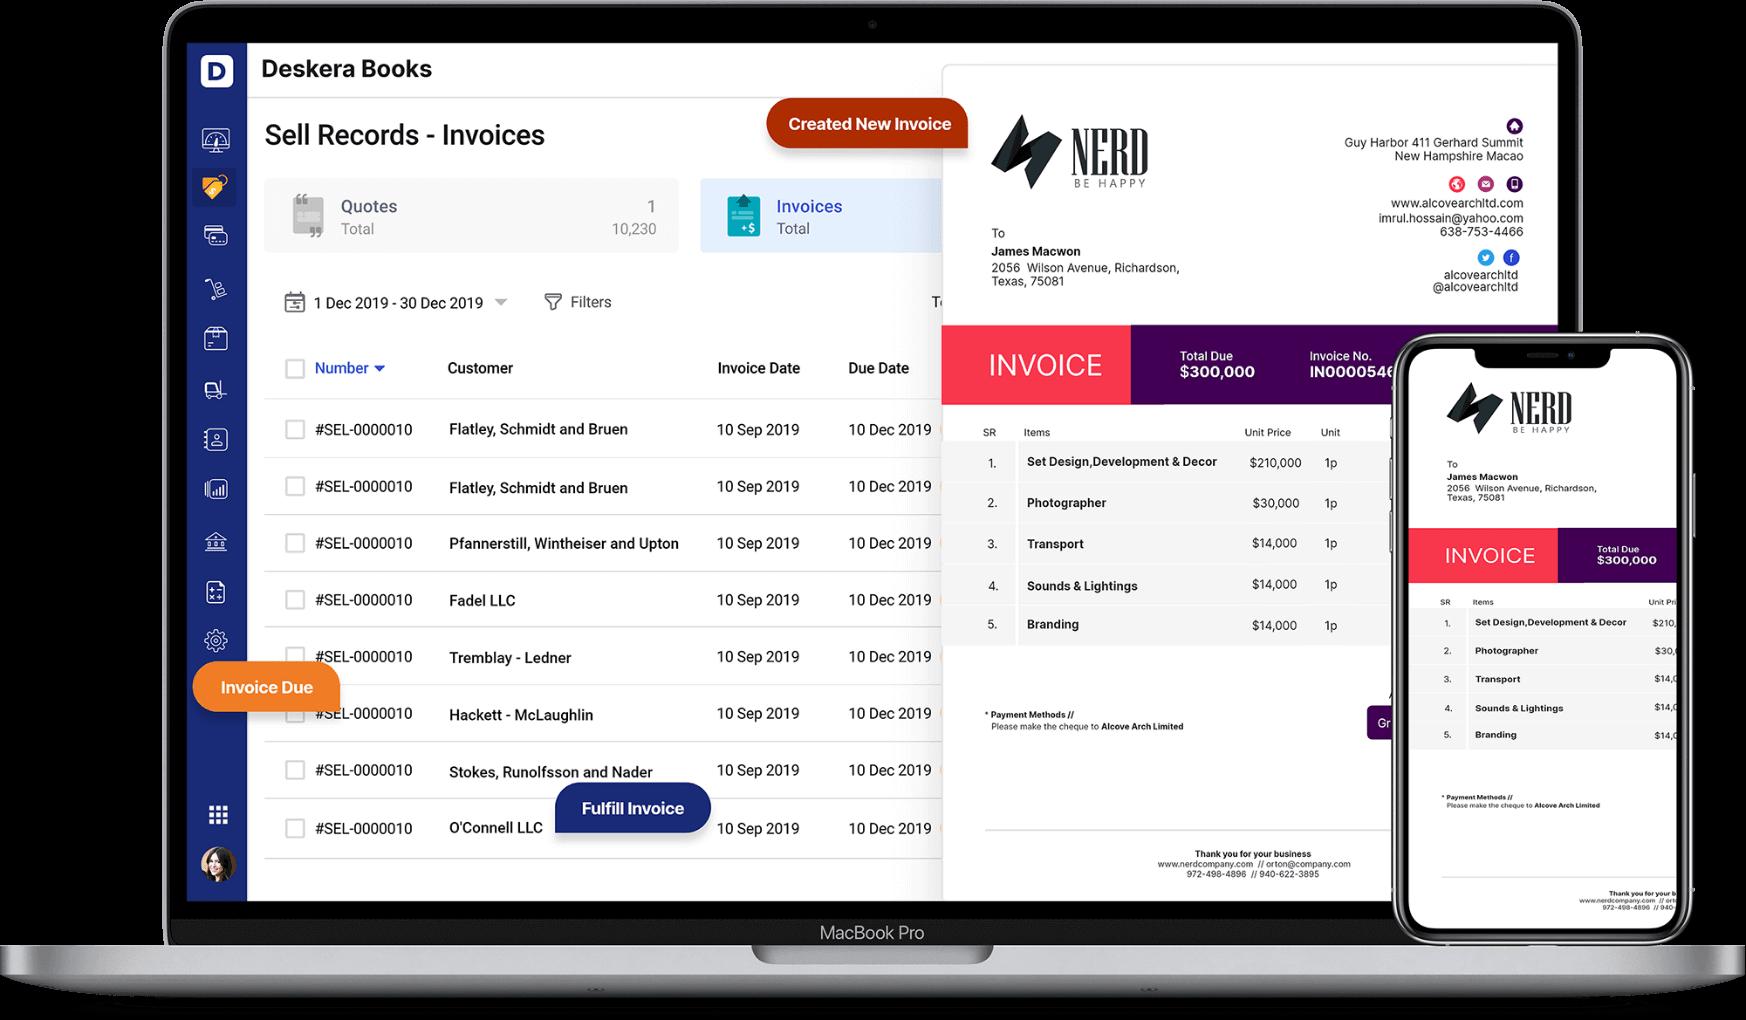 Deskera Invoices will Improve Cash Flow for Your Business